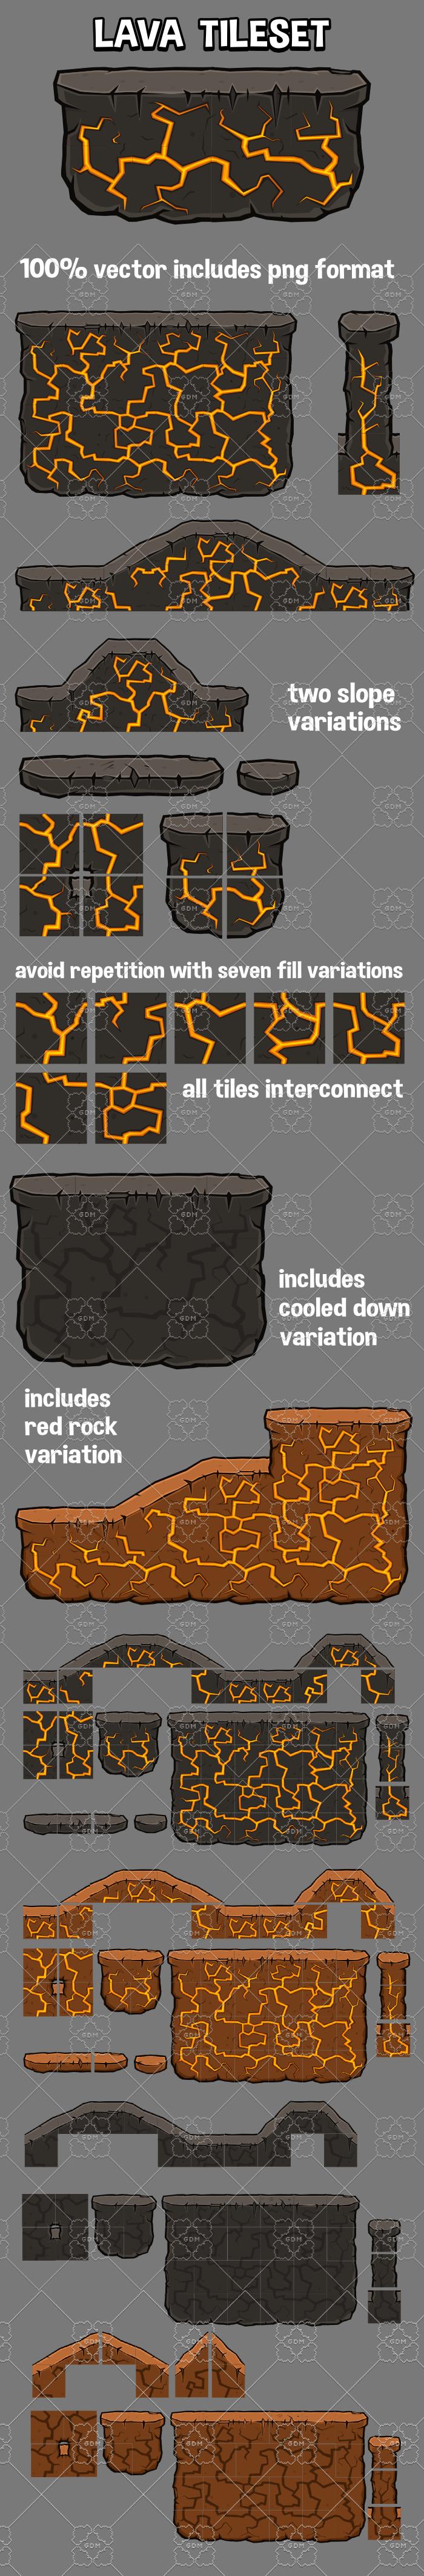 Lava themed 2d platformer tile set